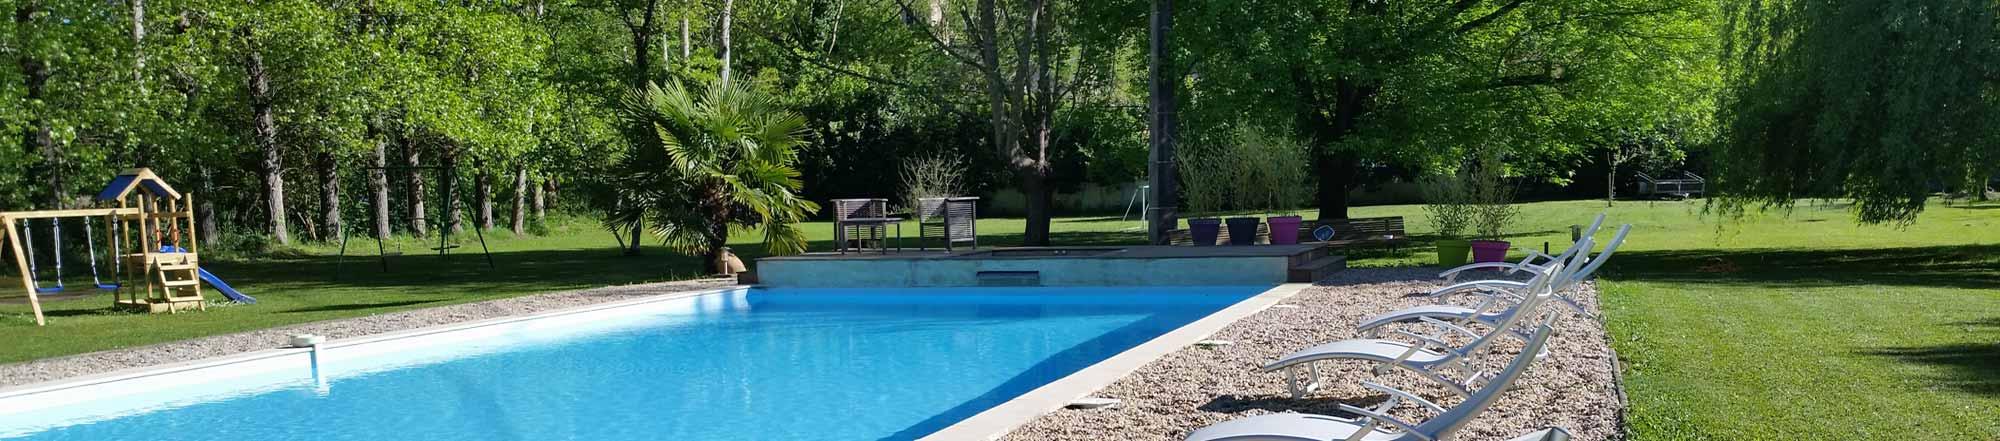 Gite Périgord Noir Dordogne Gîtes de charme avec piscine